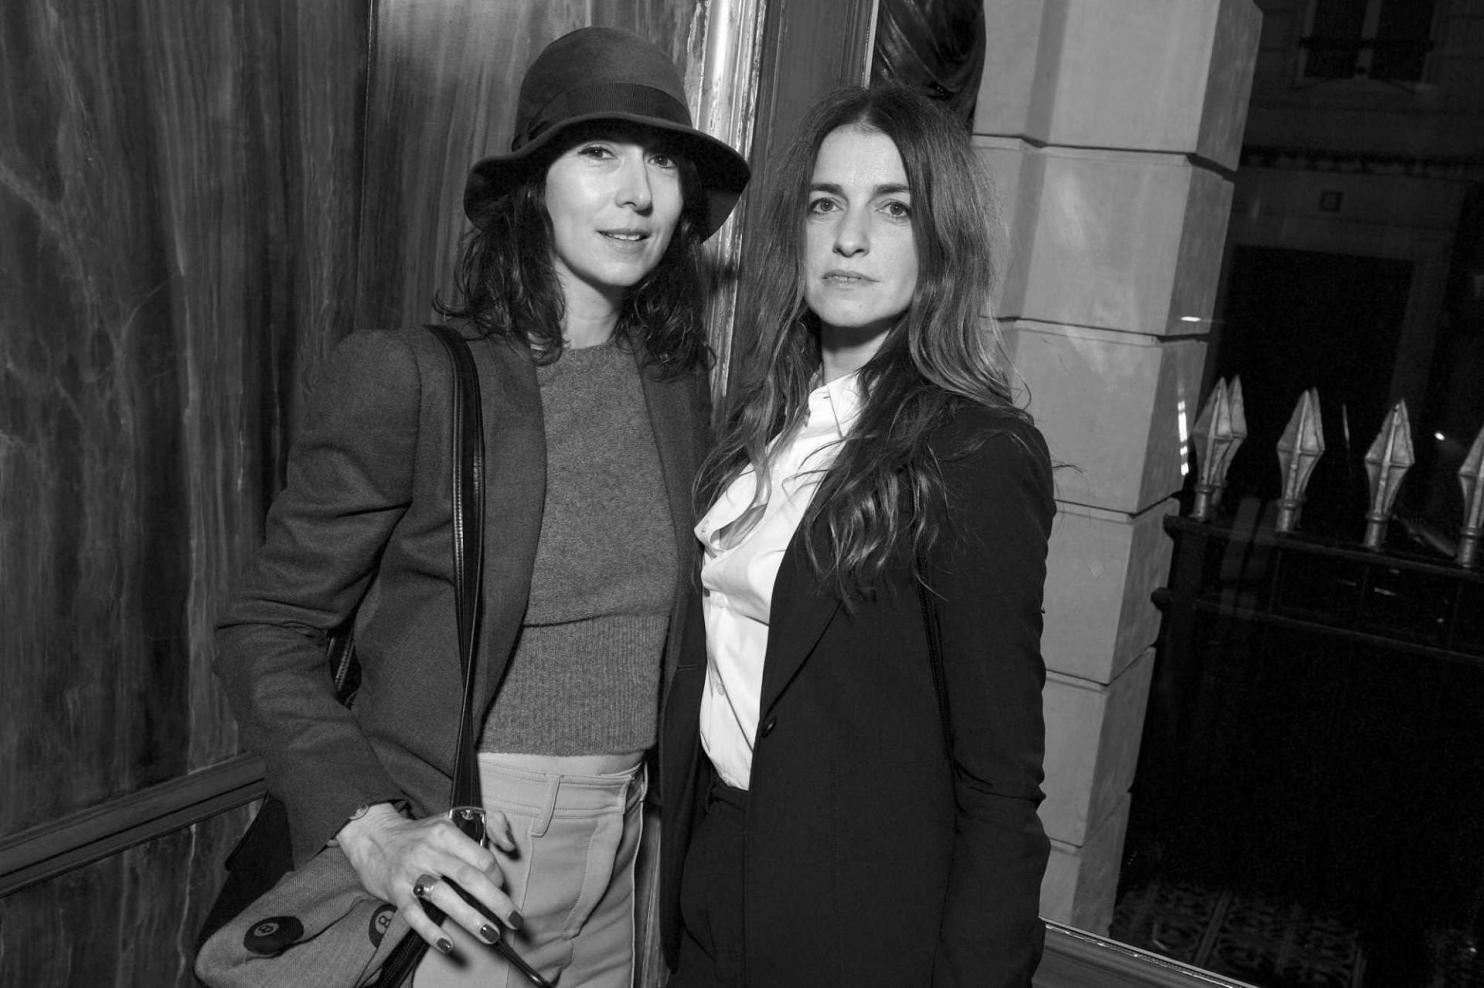 Camille Bidault-Waddington et Joana Preiss